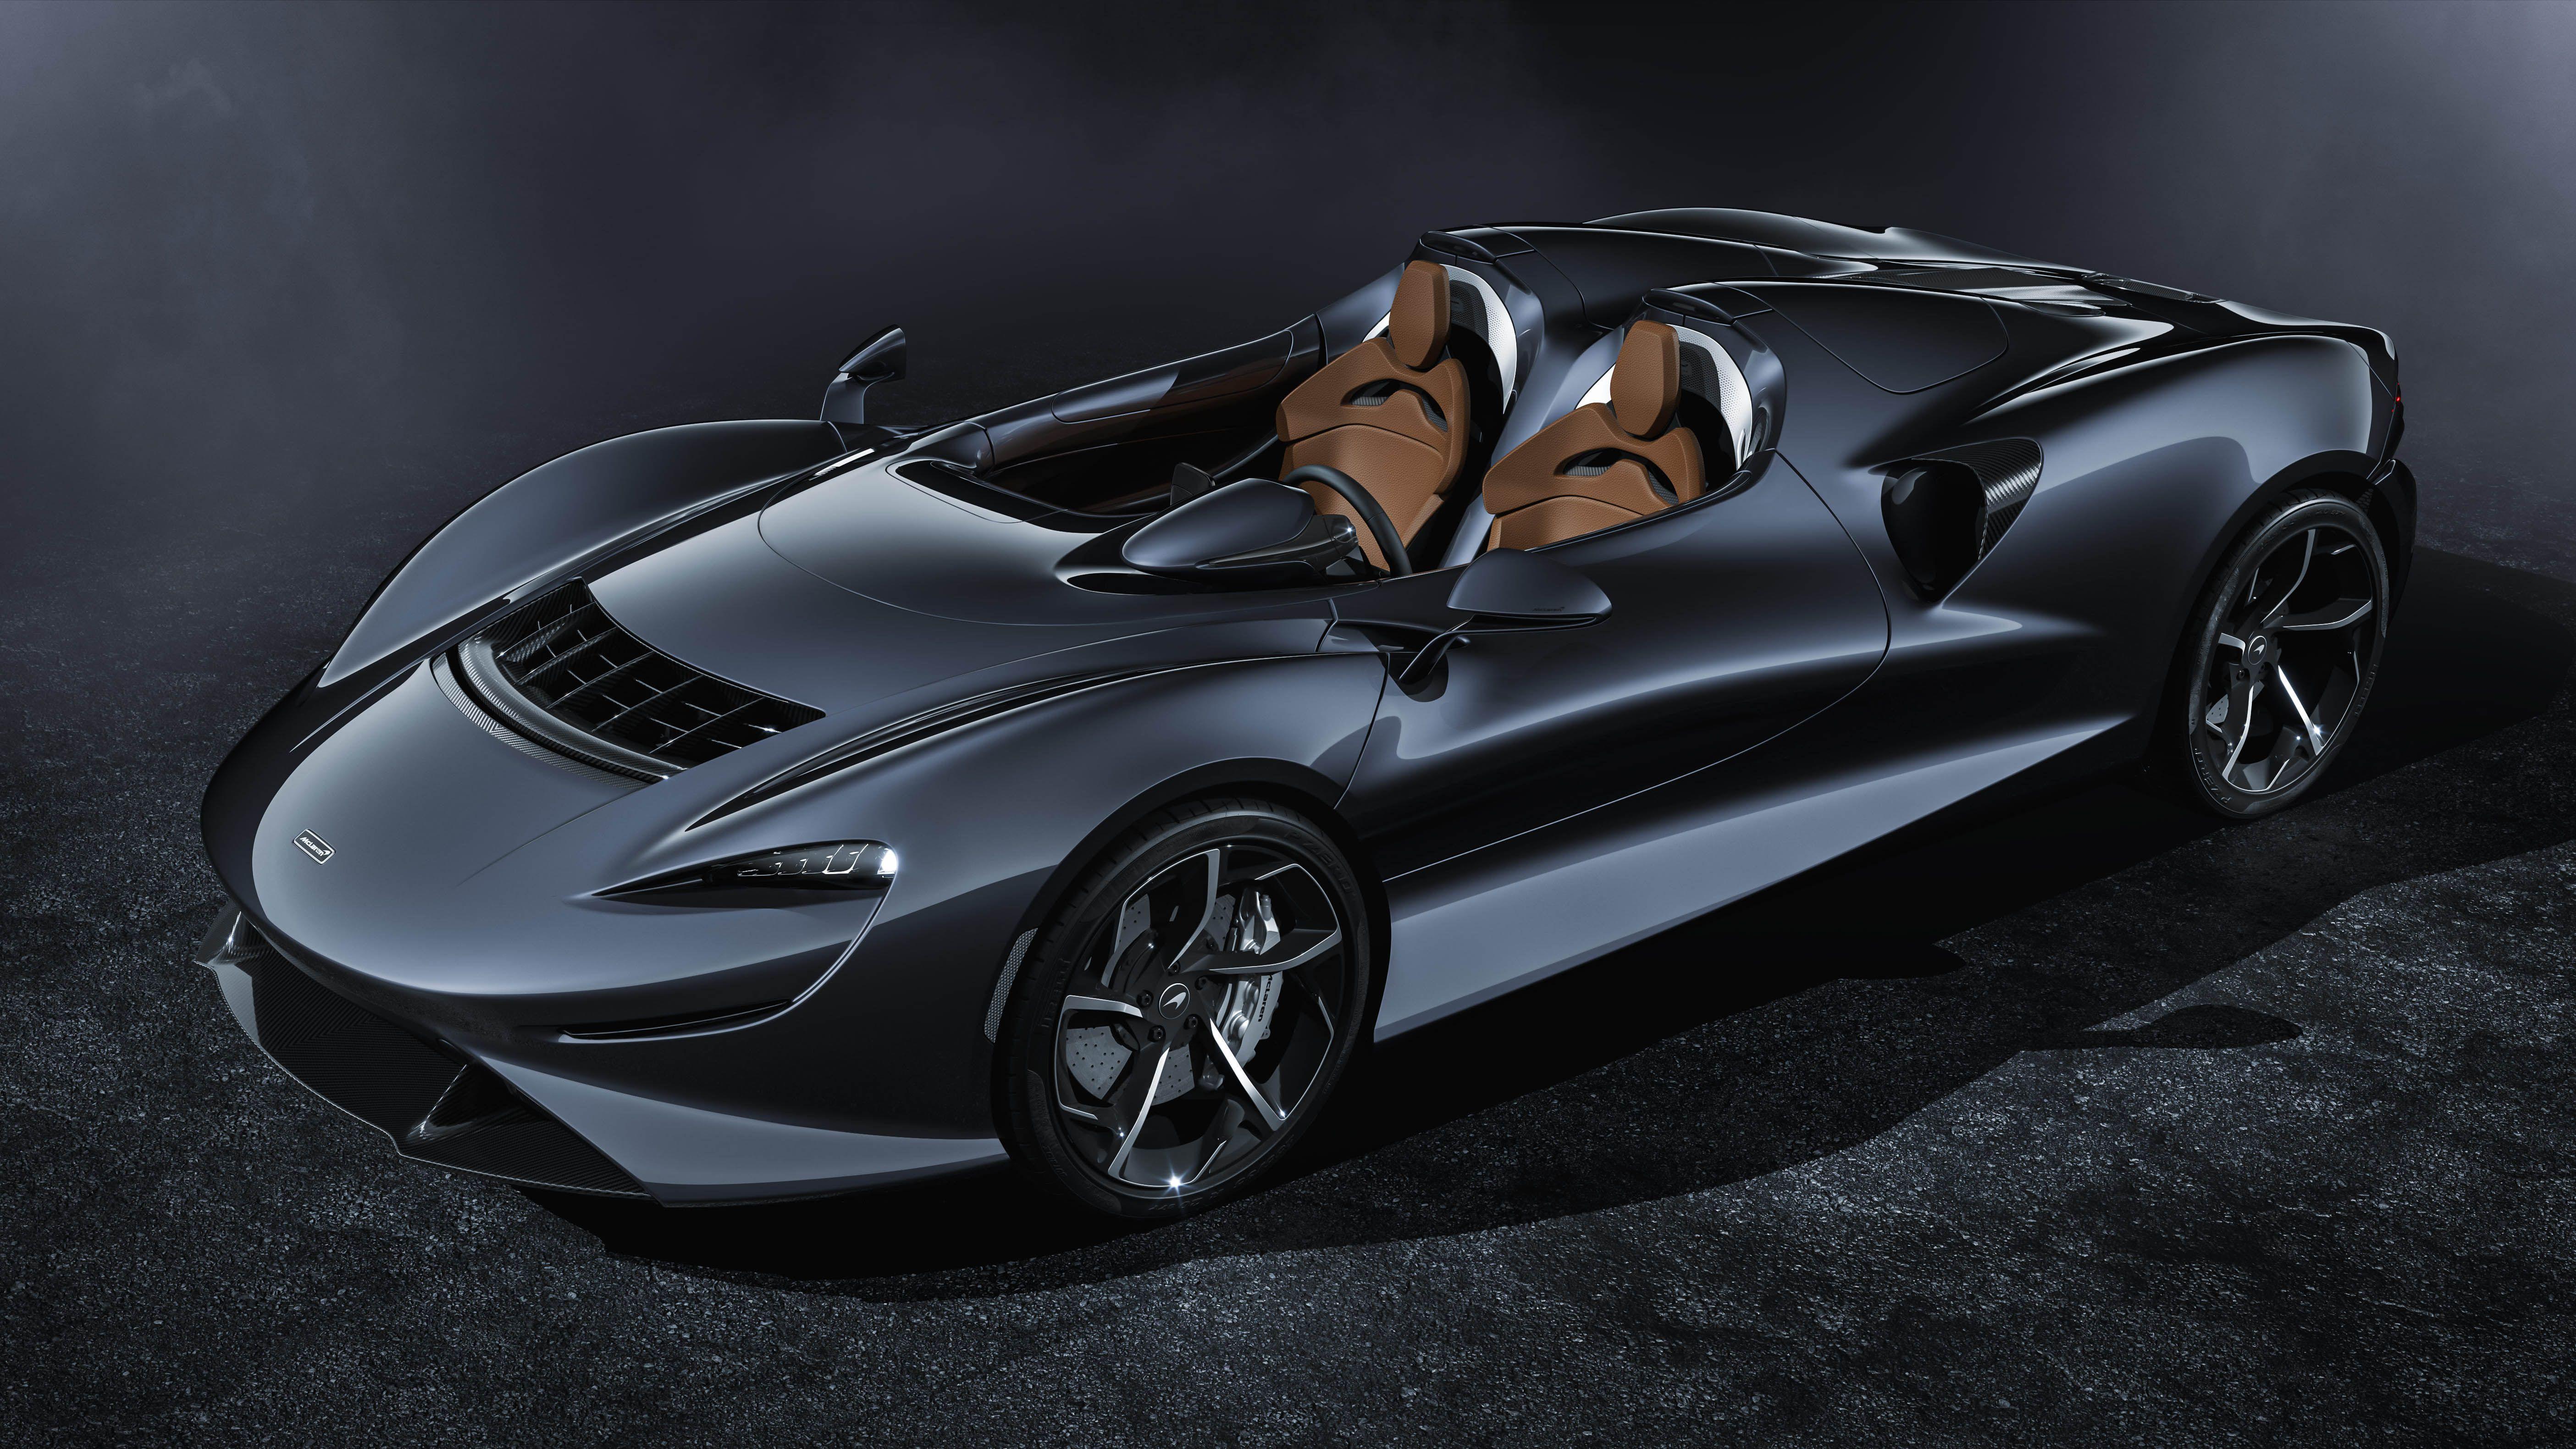 Mclaren Elva Revealed With 800 Horsepower No Windows Or Roof New Mclaren Super Cars Sports Car